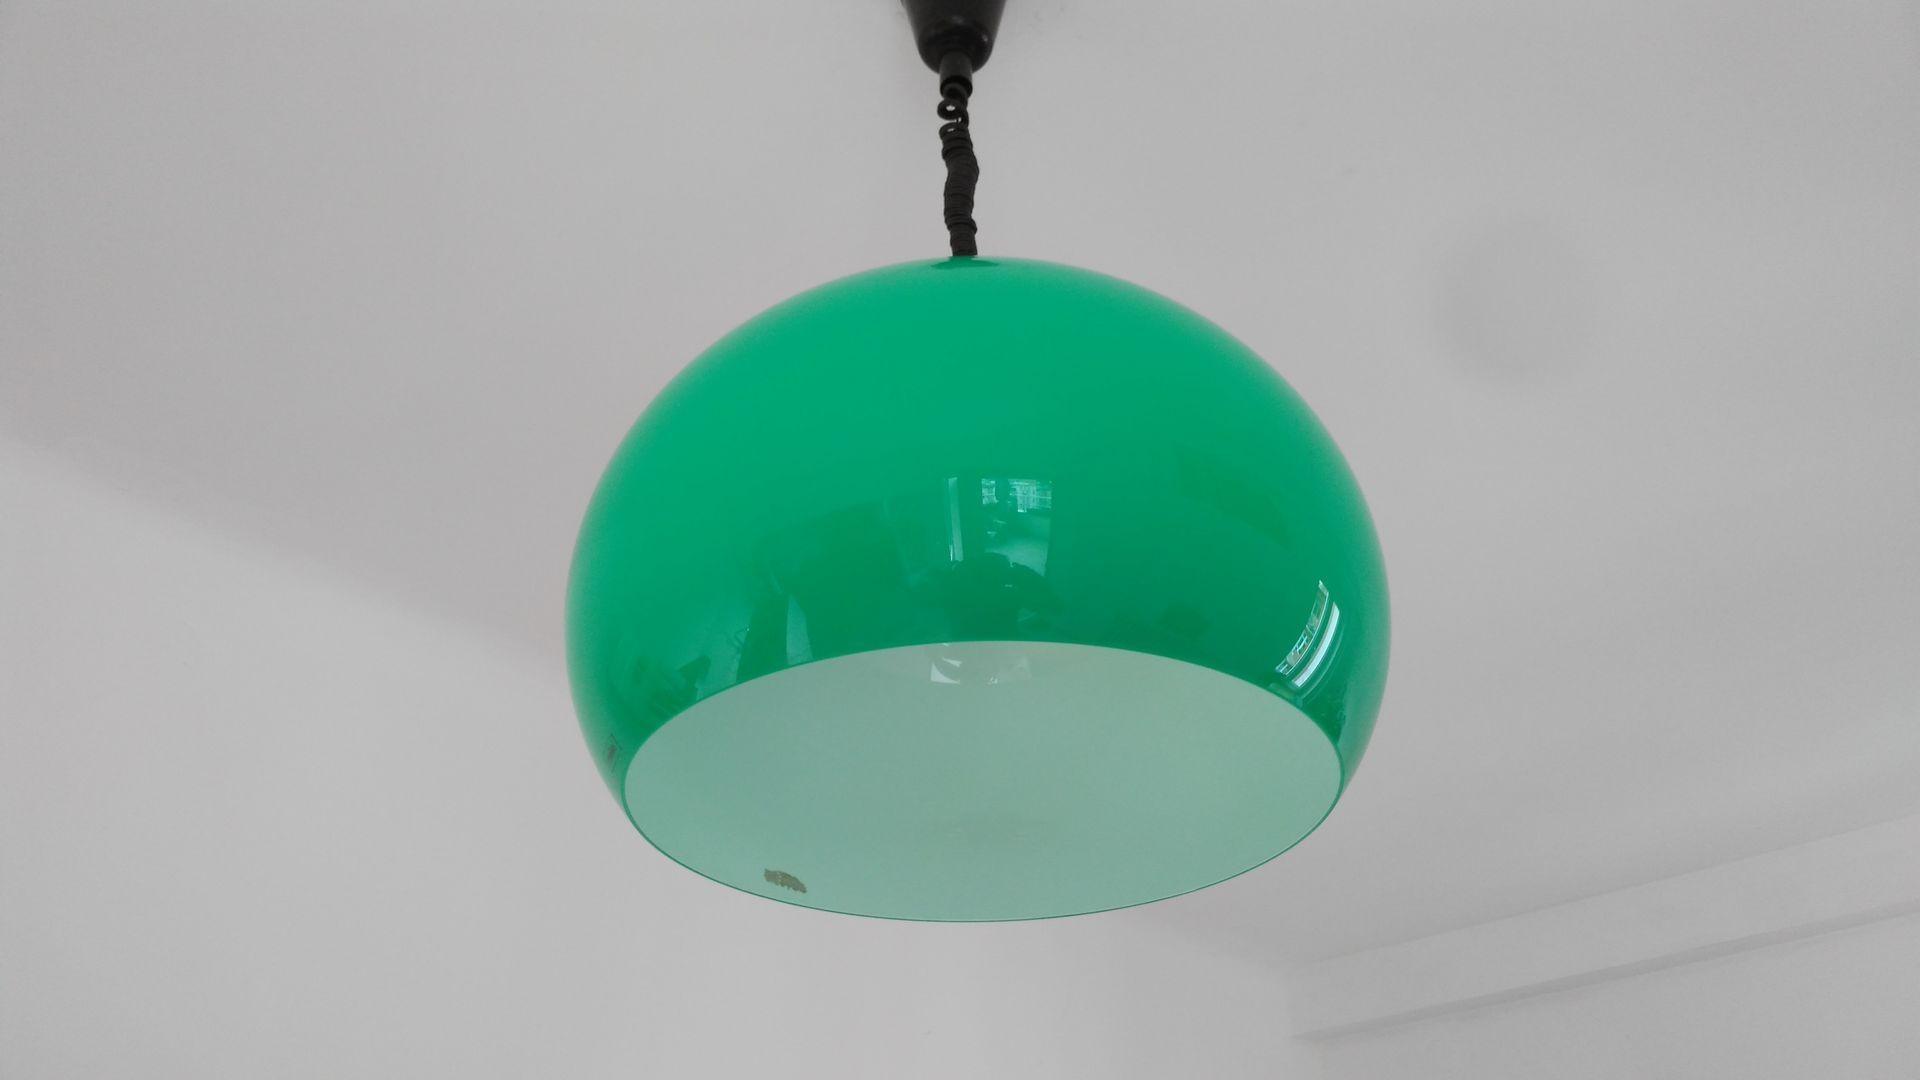 Mid century green pendant light by harvey guzzini for meblo for sale mid century green pendant light by harvey guzzini for meblo aloadofball Choice Image